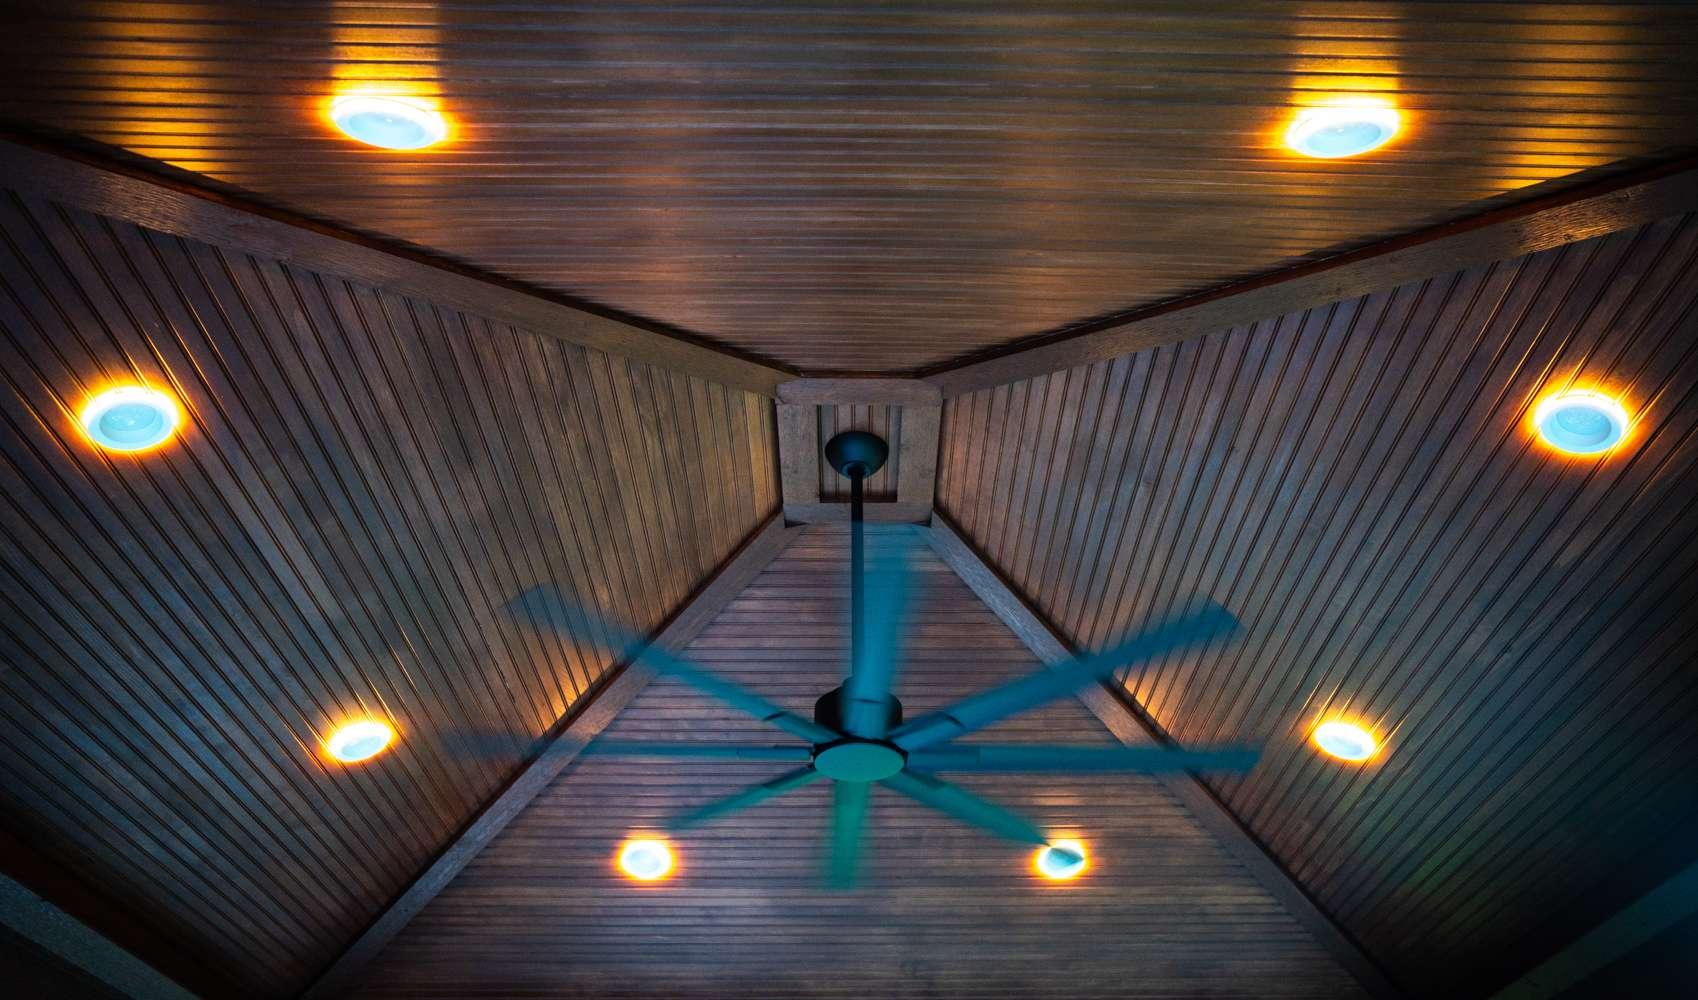 Pavilion ceiling lights and fan